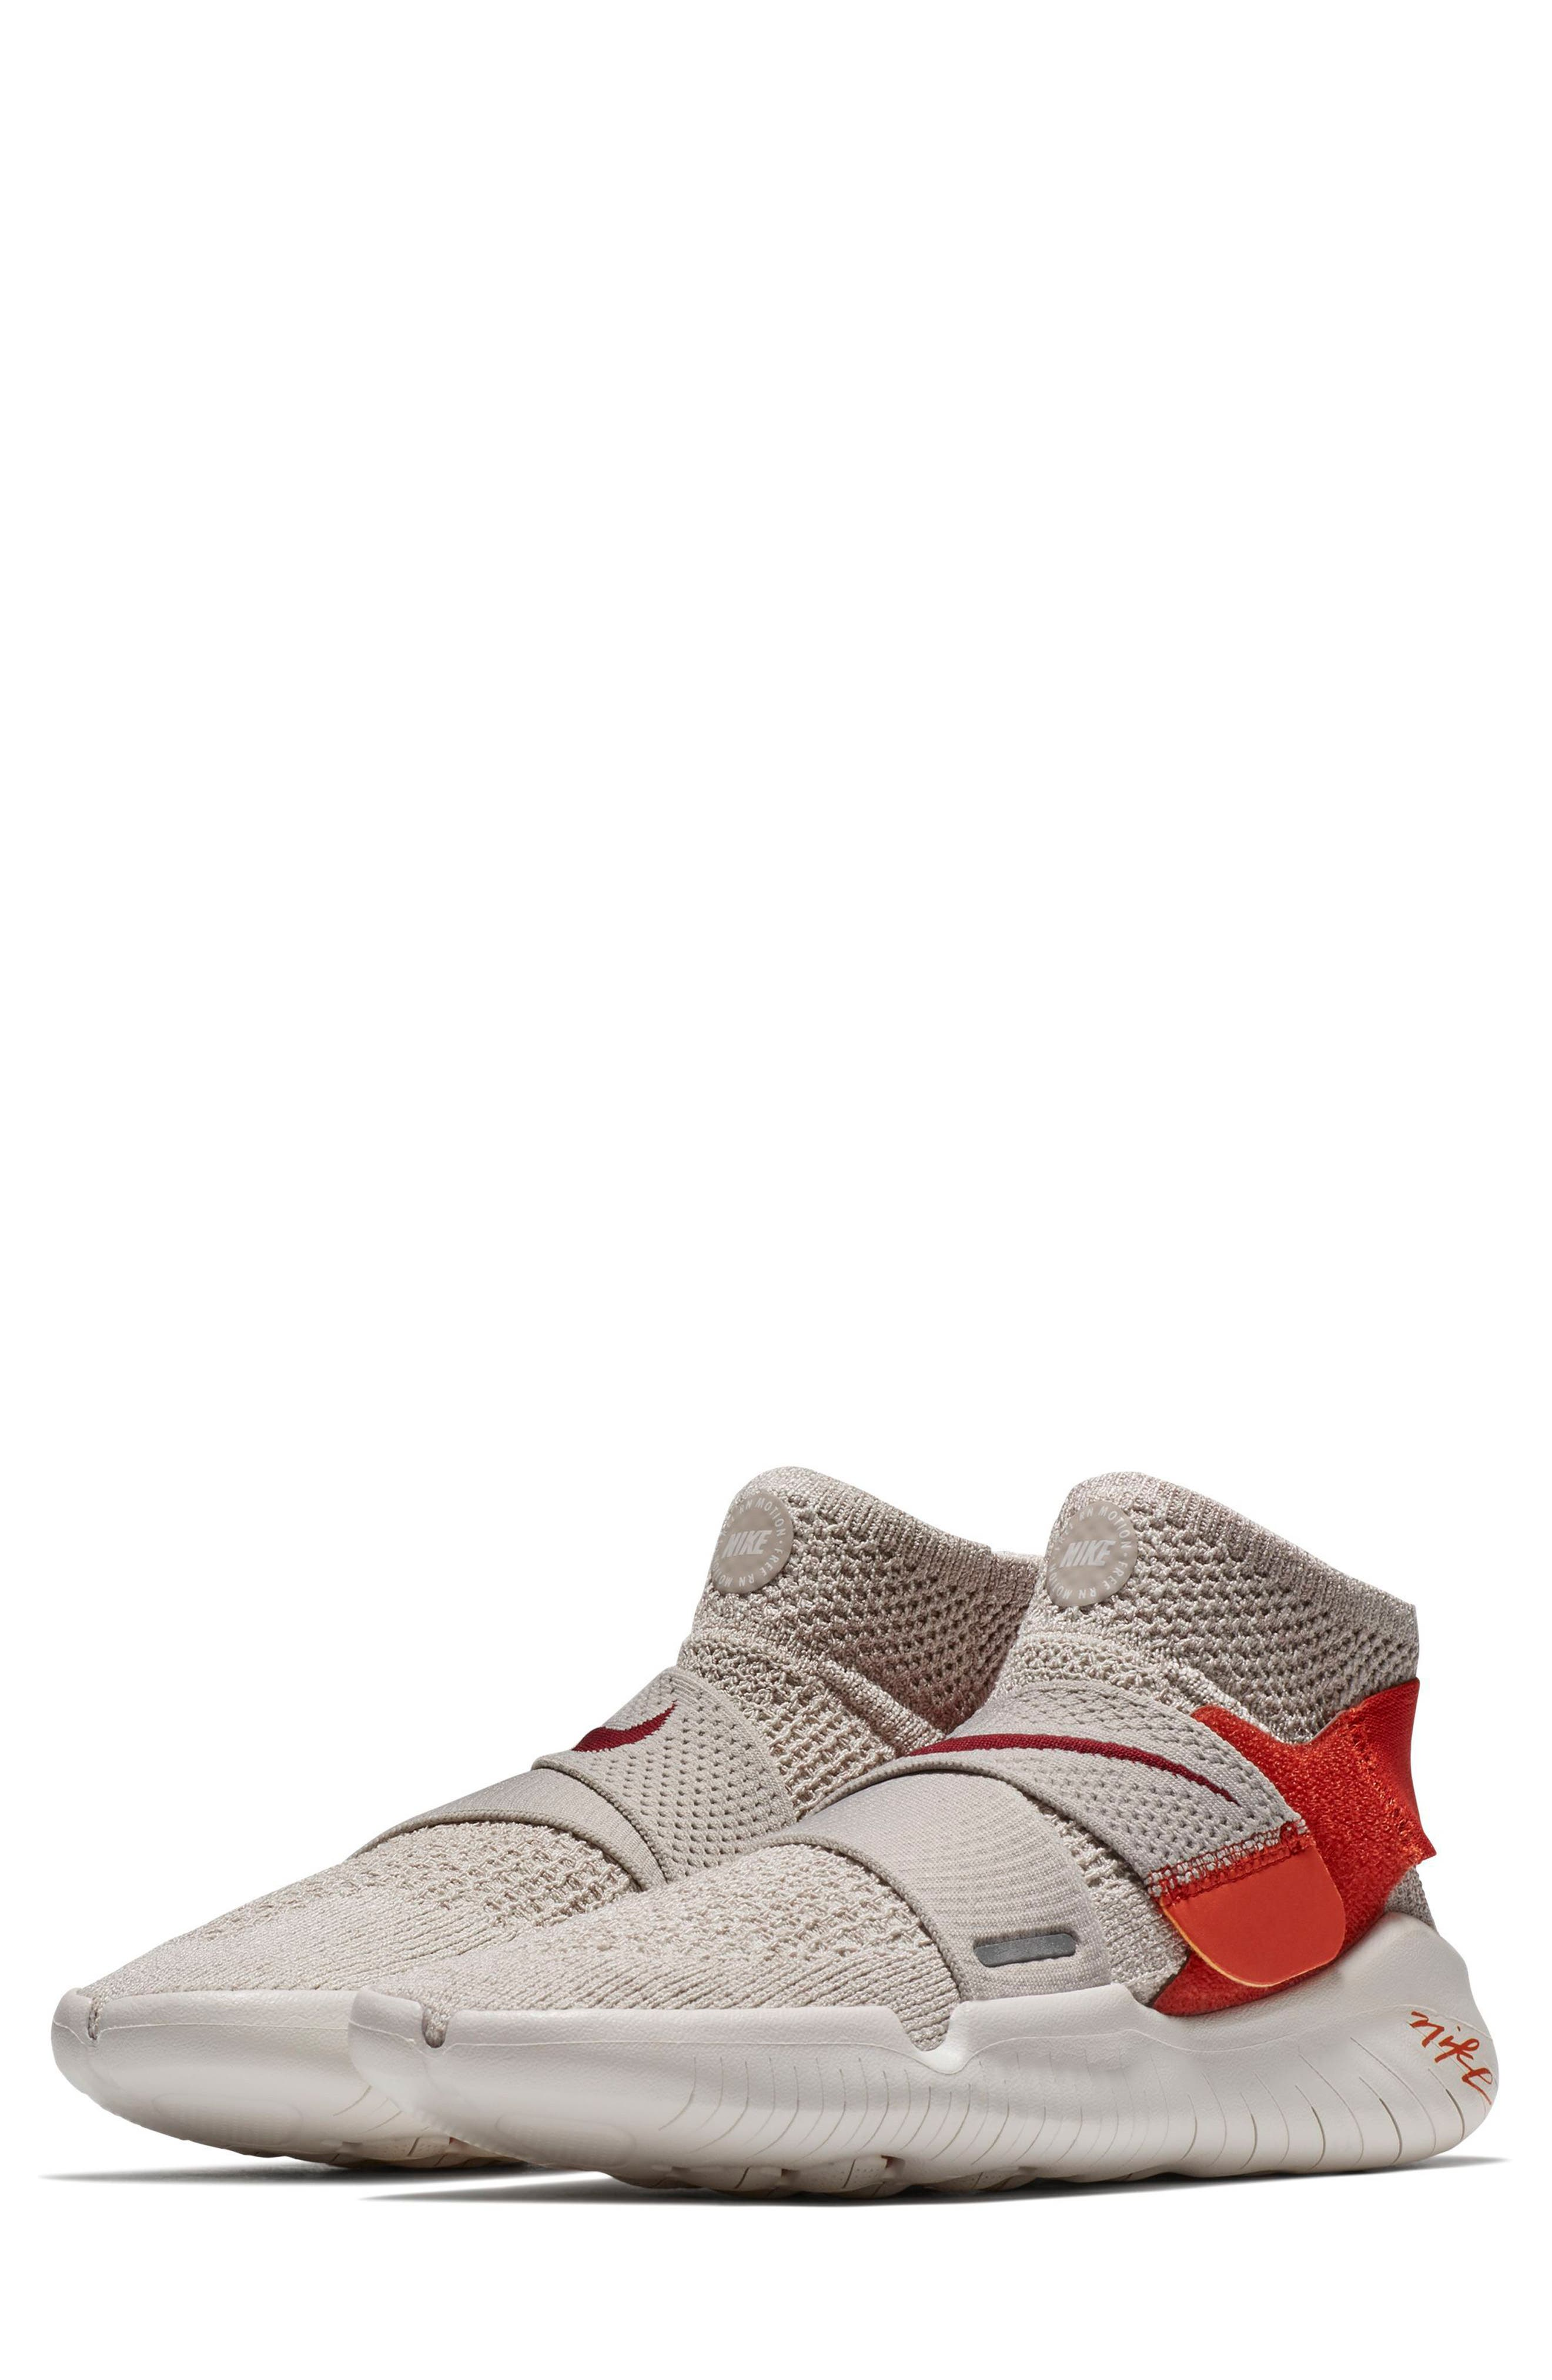 8c104459e6446 Imágenes de Womens Nike Free Rn Motion Flyknit 2018 Running Shoes